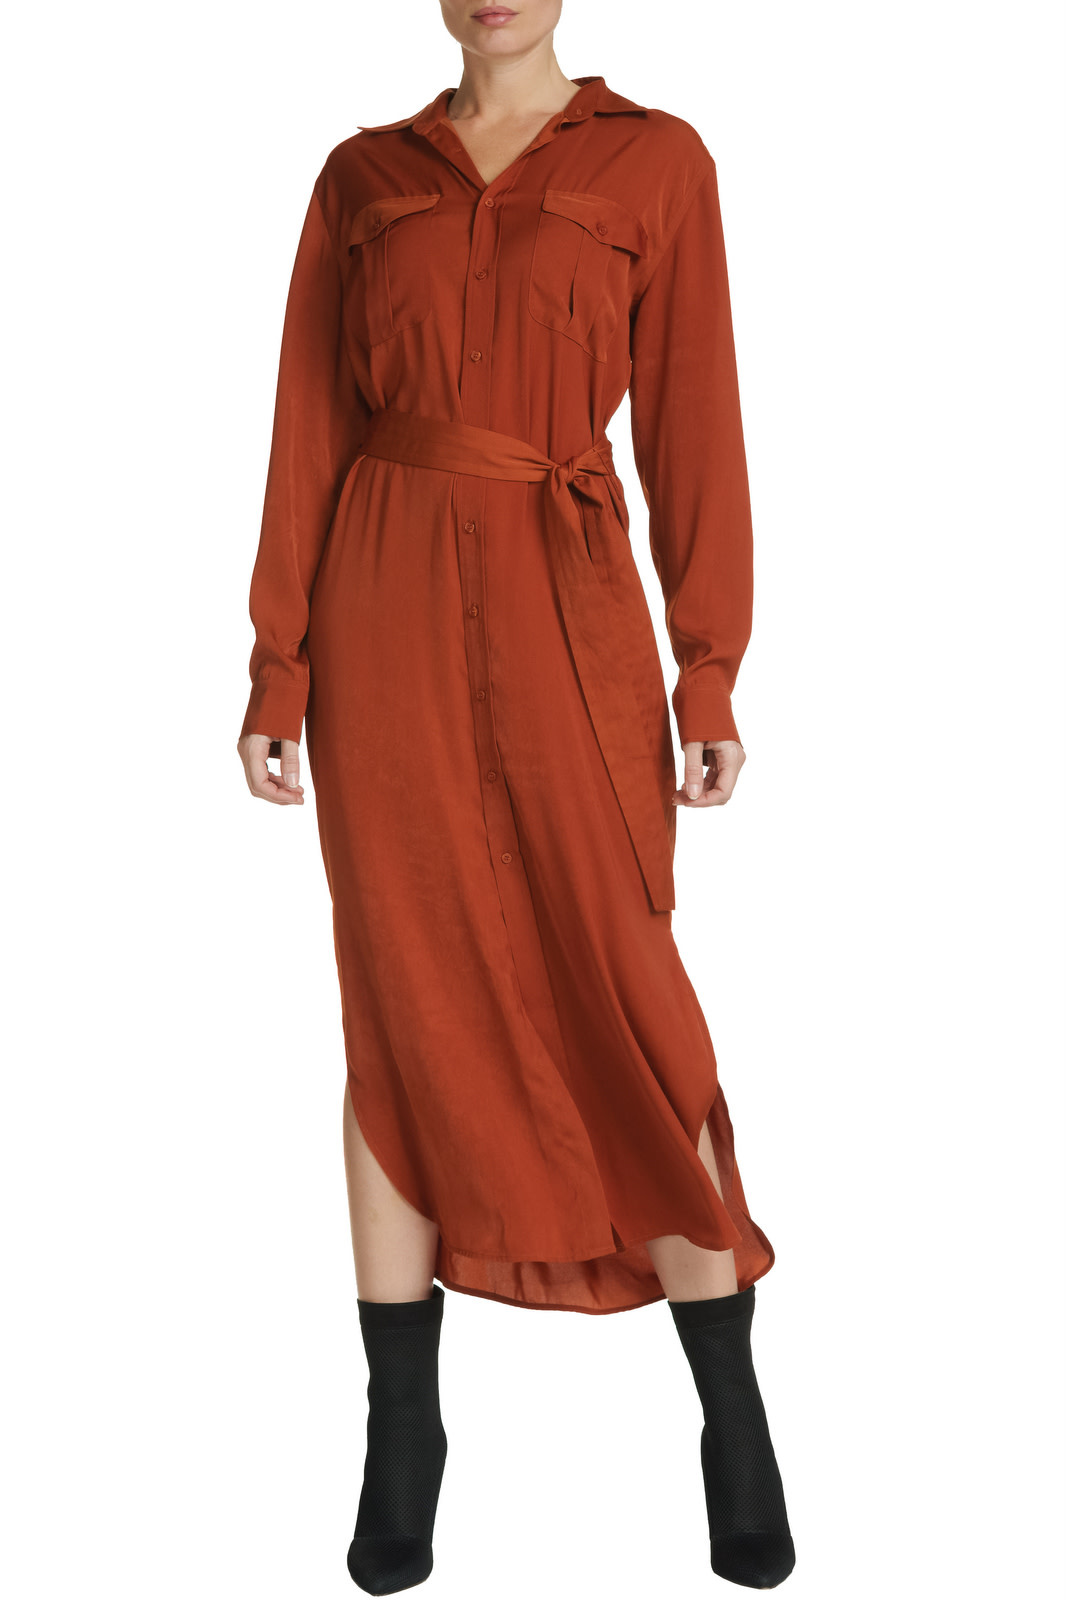 Seek The Label Maxi Dress Button Down W/Belt